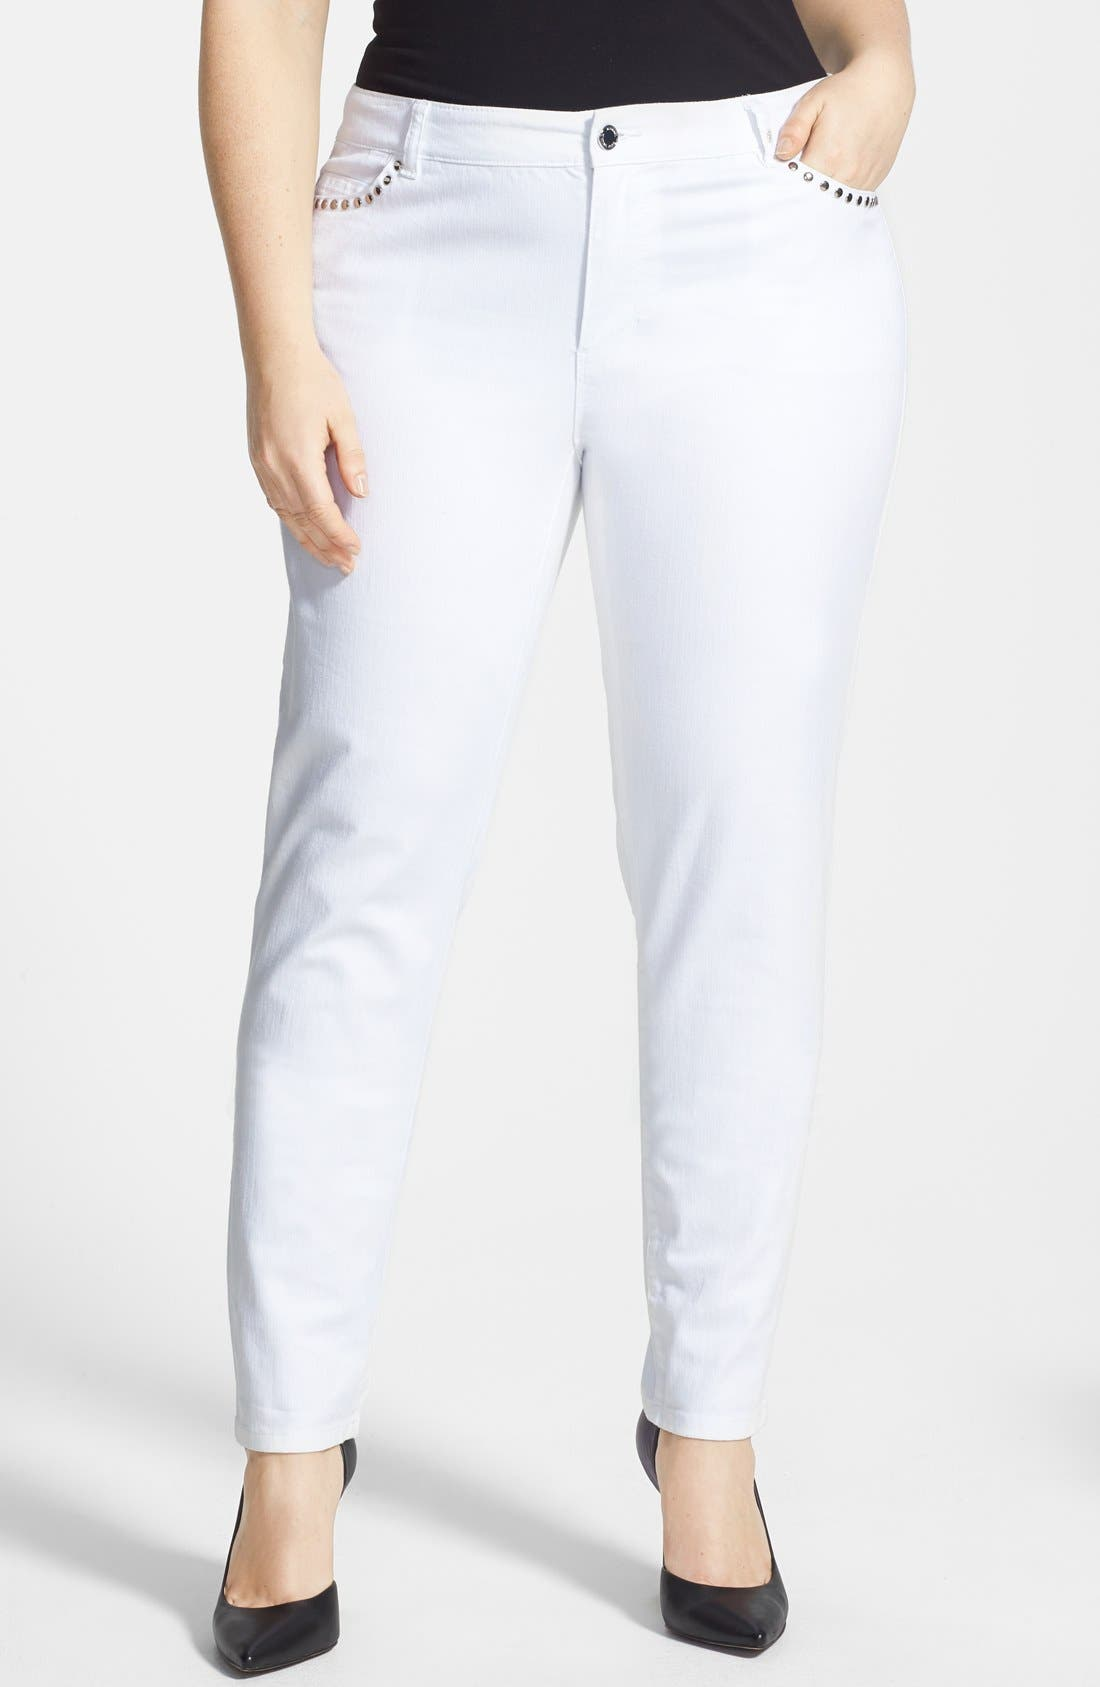 Alternate Image 1 Selected - MICHAEL Michael Kors Rivet Stud Skinny Jeans (White) (Plus Size)